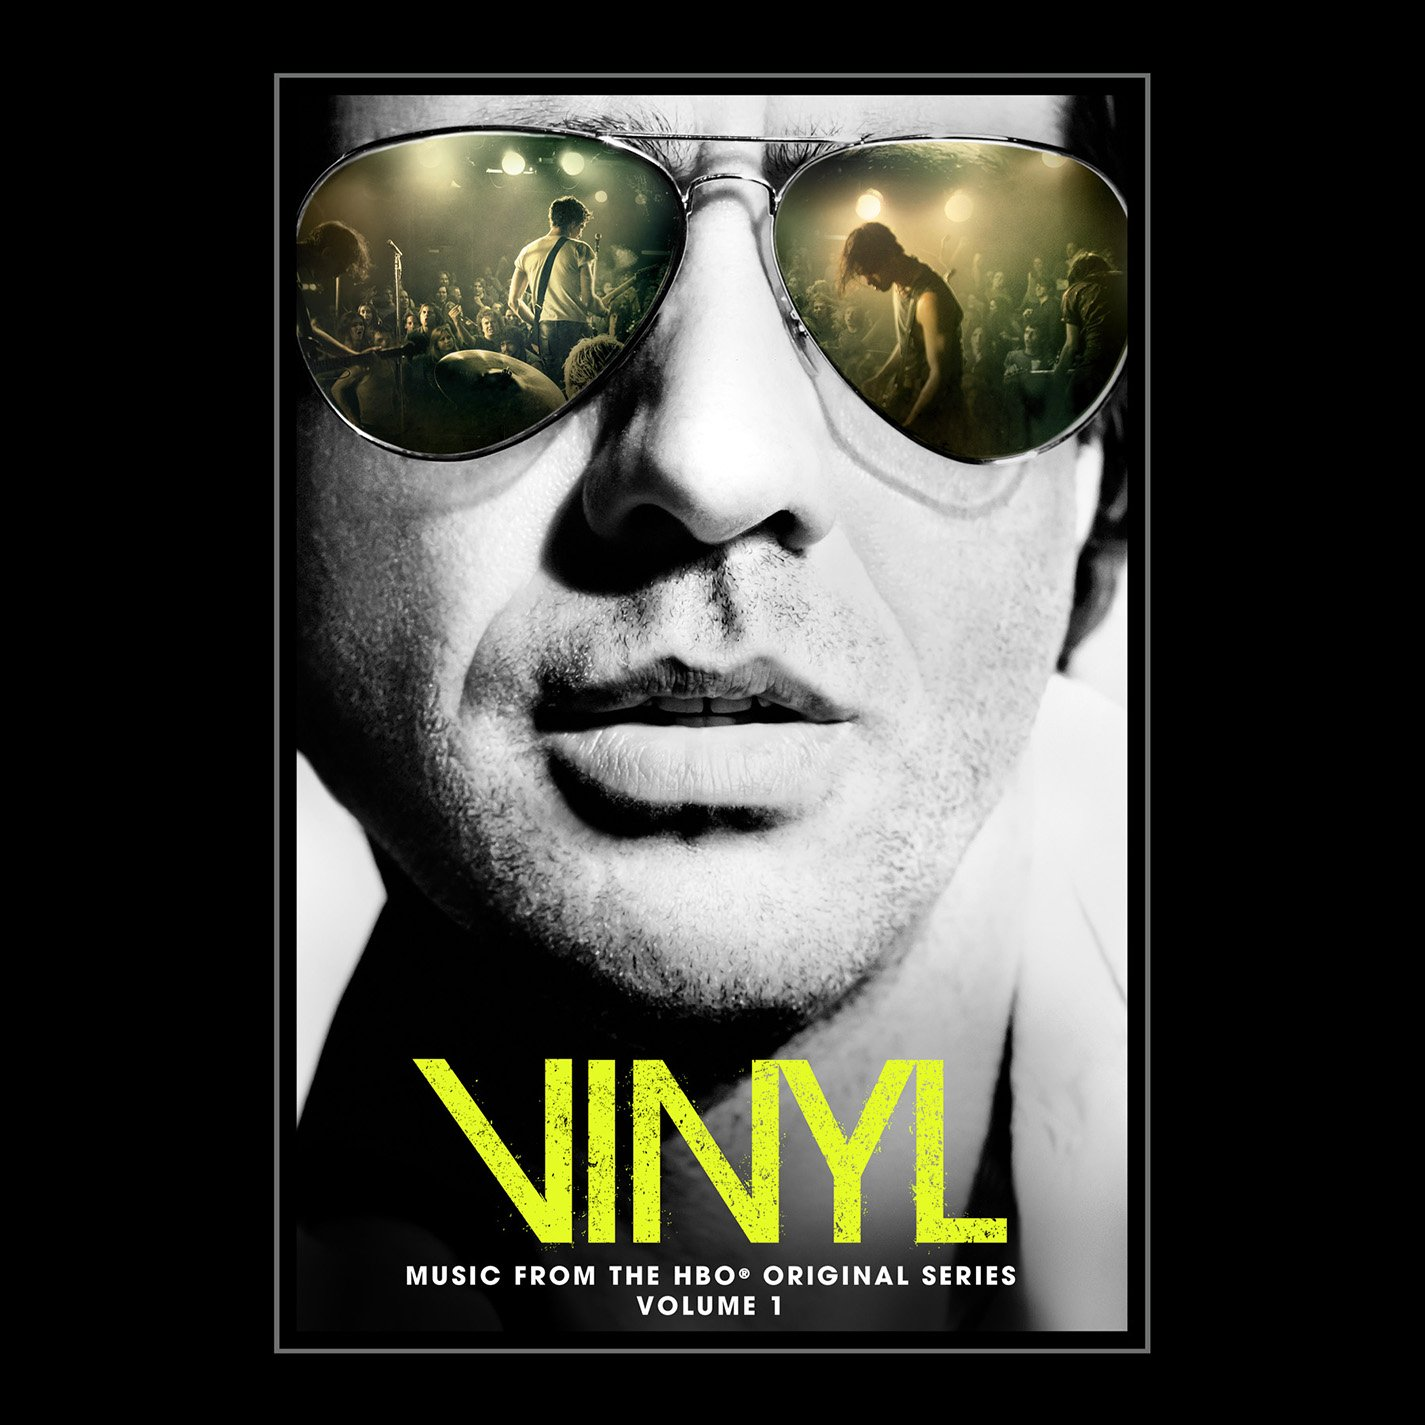 Vinyl Season 1 Soundtrack